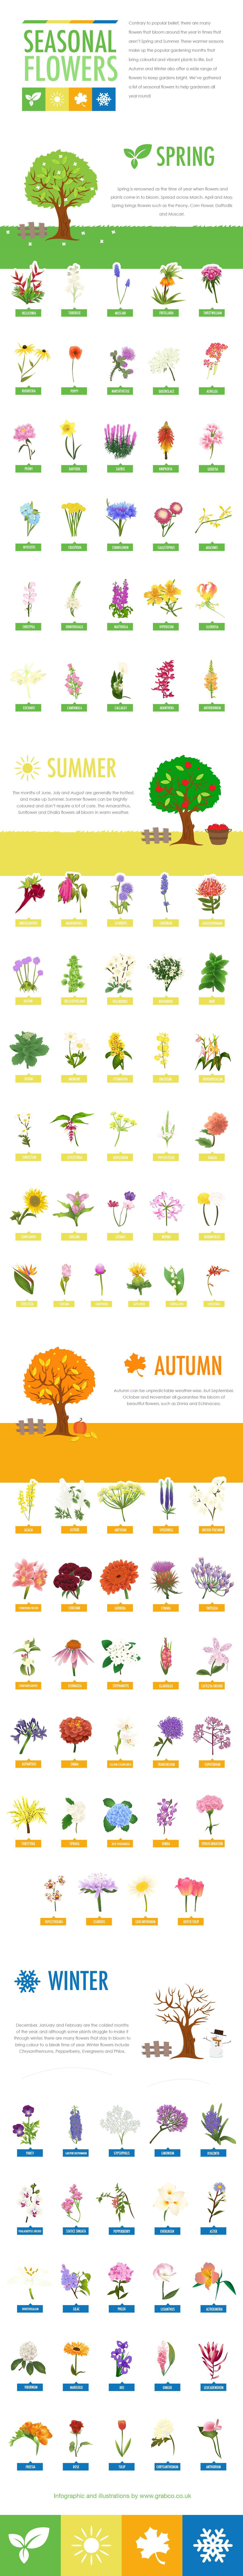 Seasonal Flowers Infographic Grabco Seasonal Flowers Fall Flowers Garden Seasonal Garden